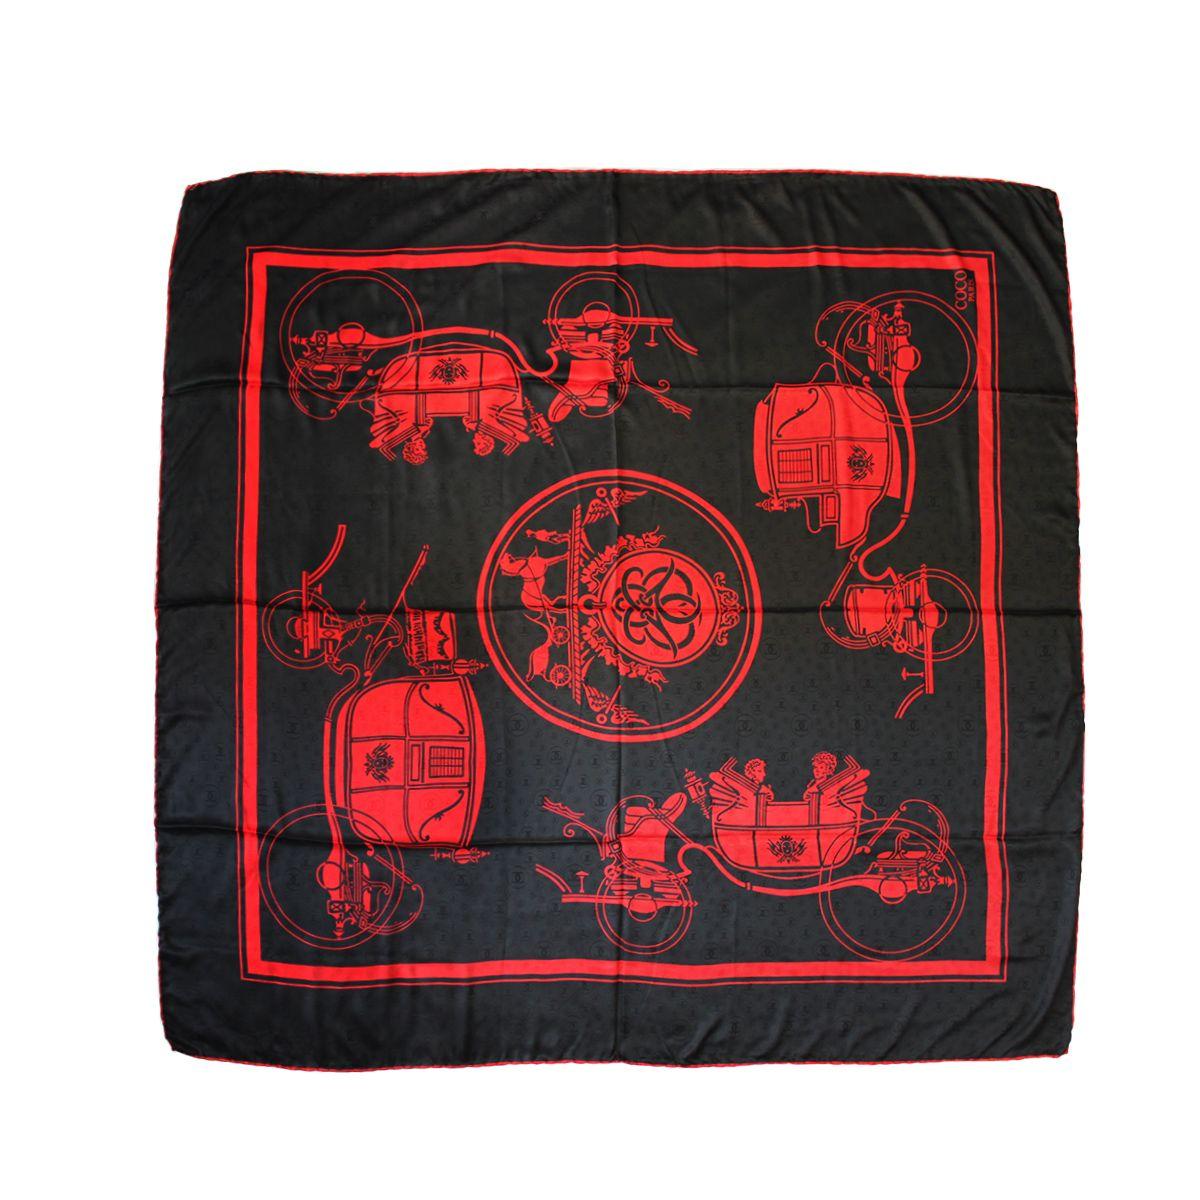 روسری زنانه کوکو طرح درشکه کد 3952 -  - 5